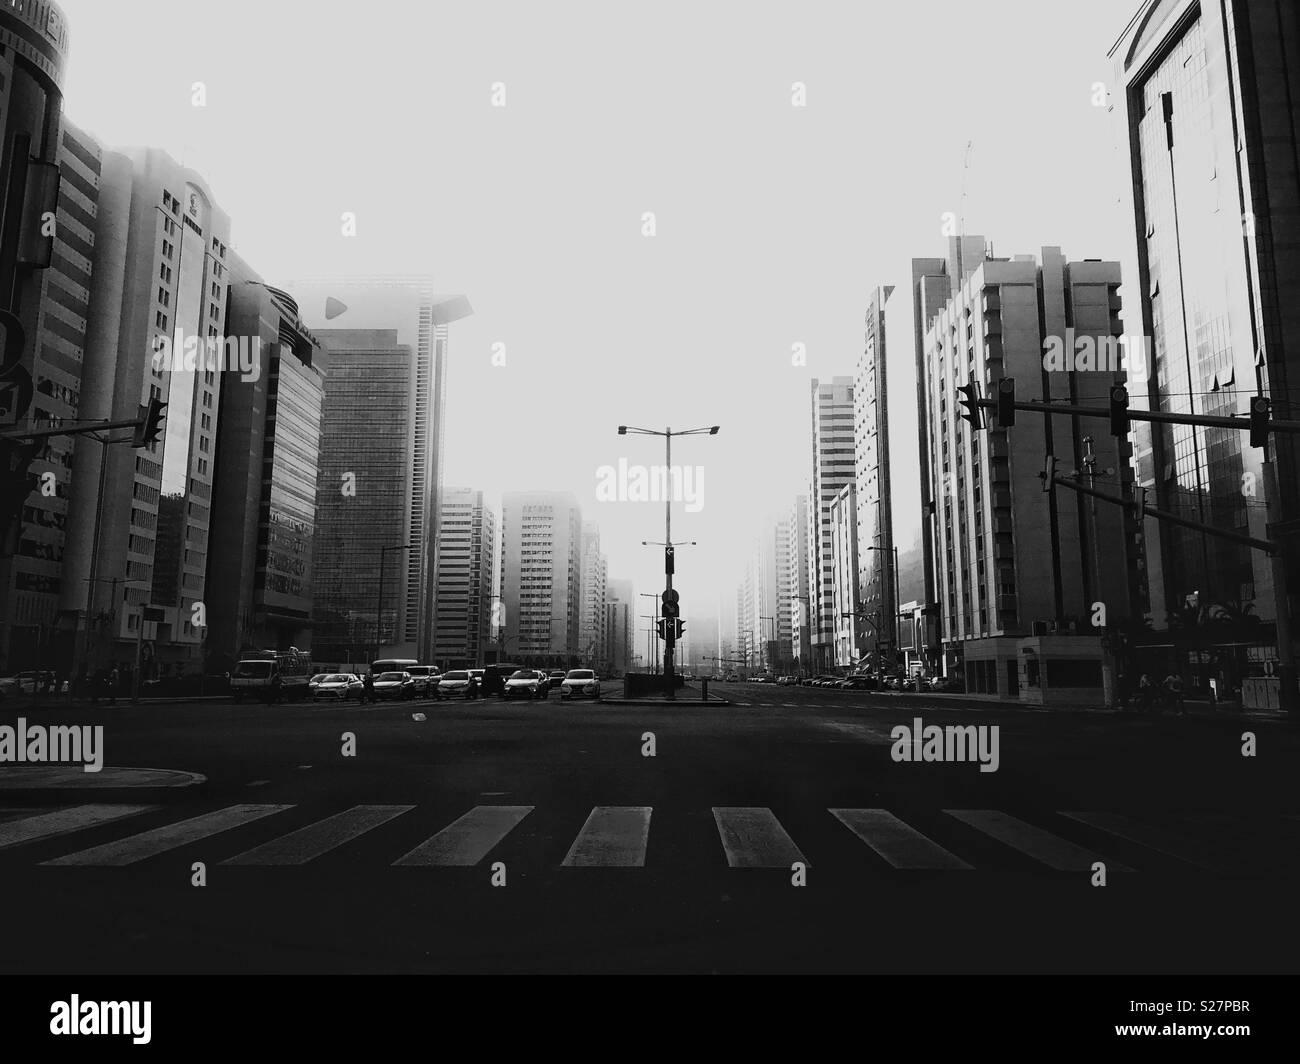 View of Salam Street Abu Dhabi - Stock Image